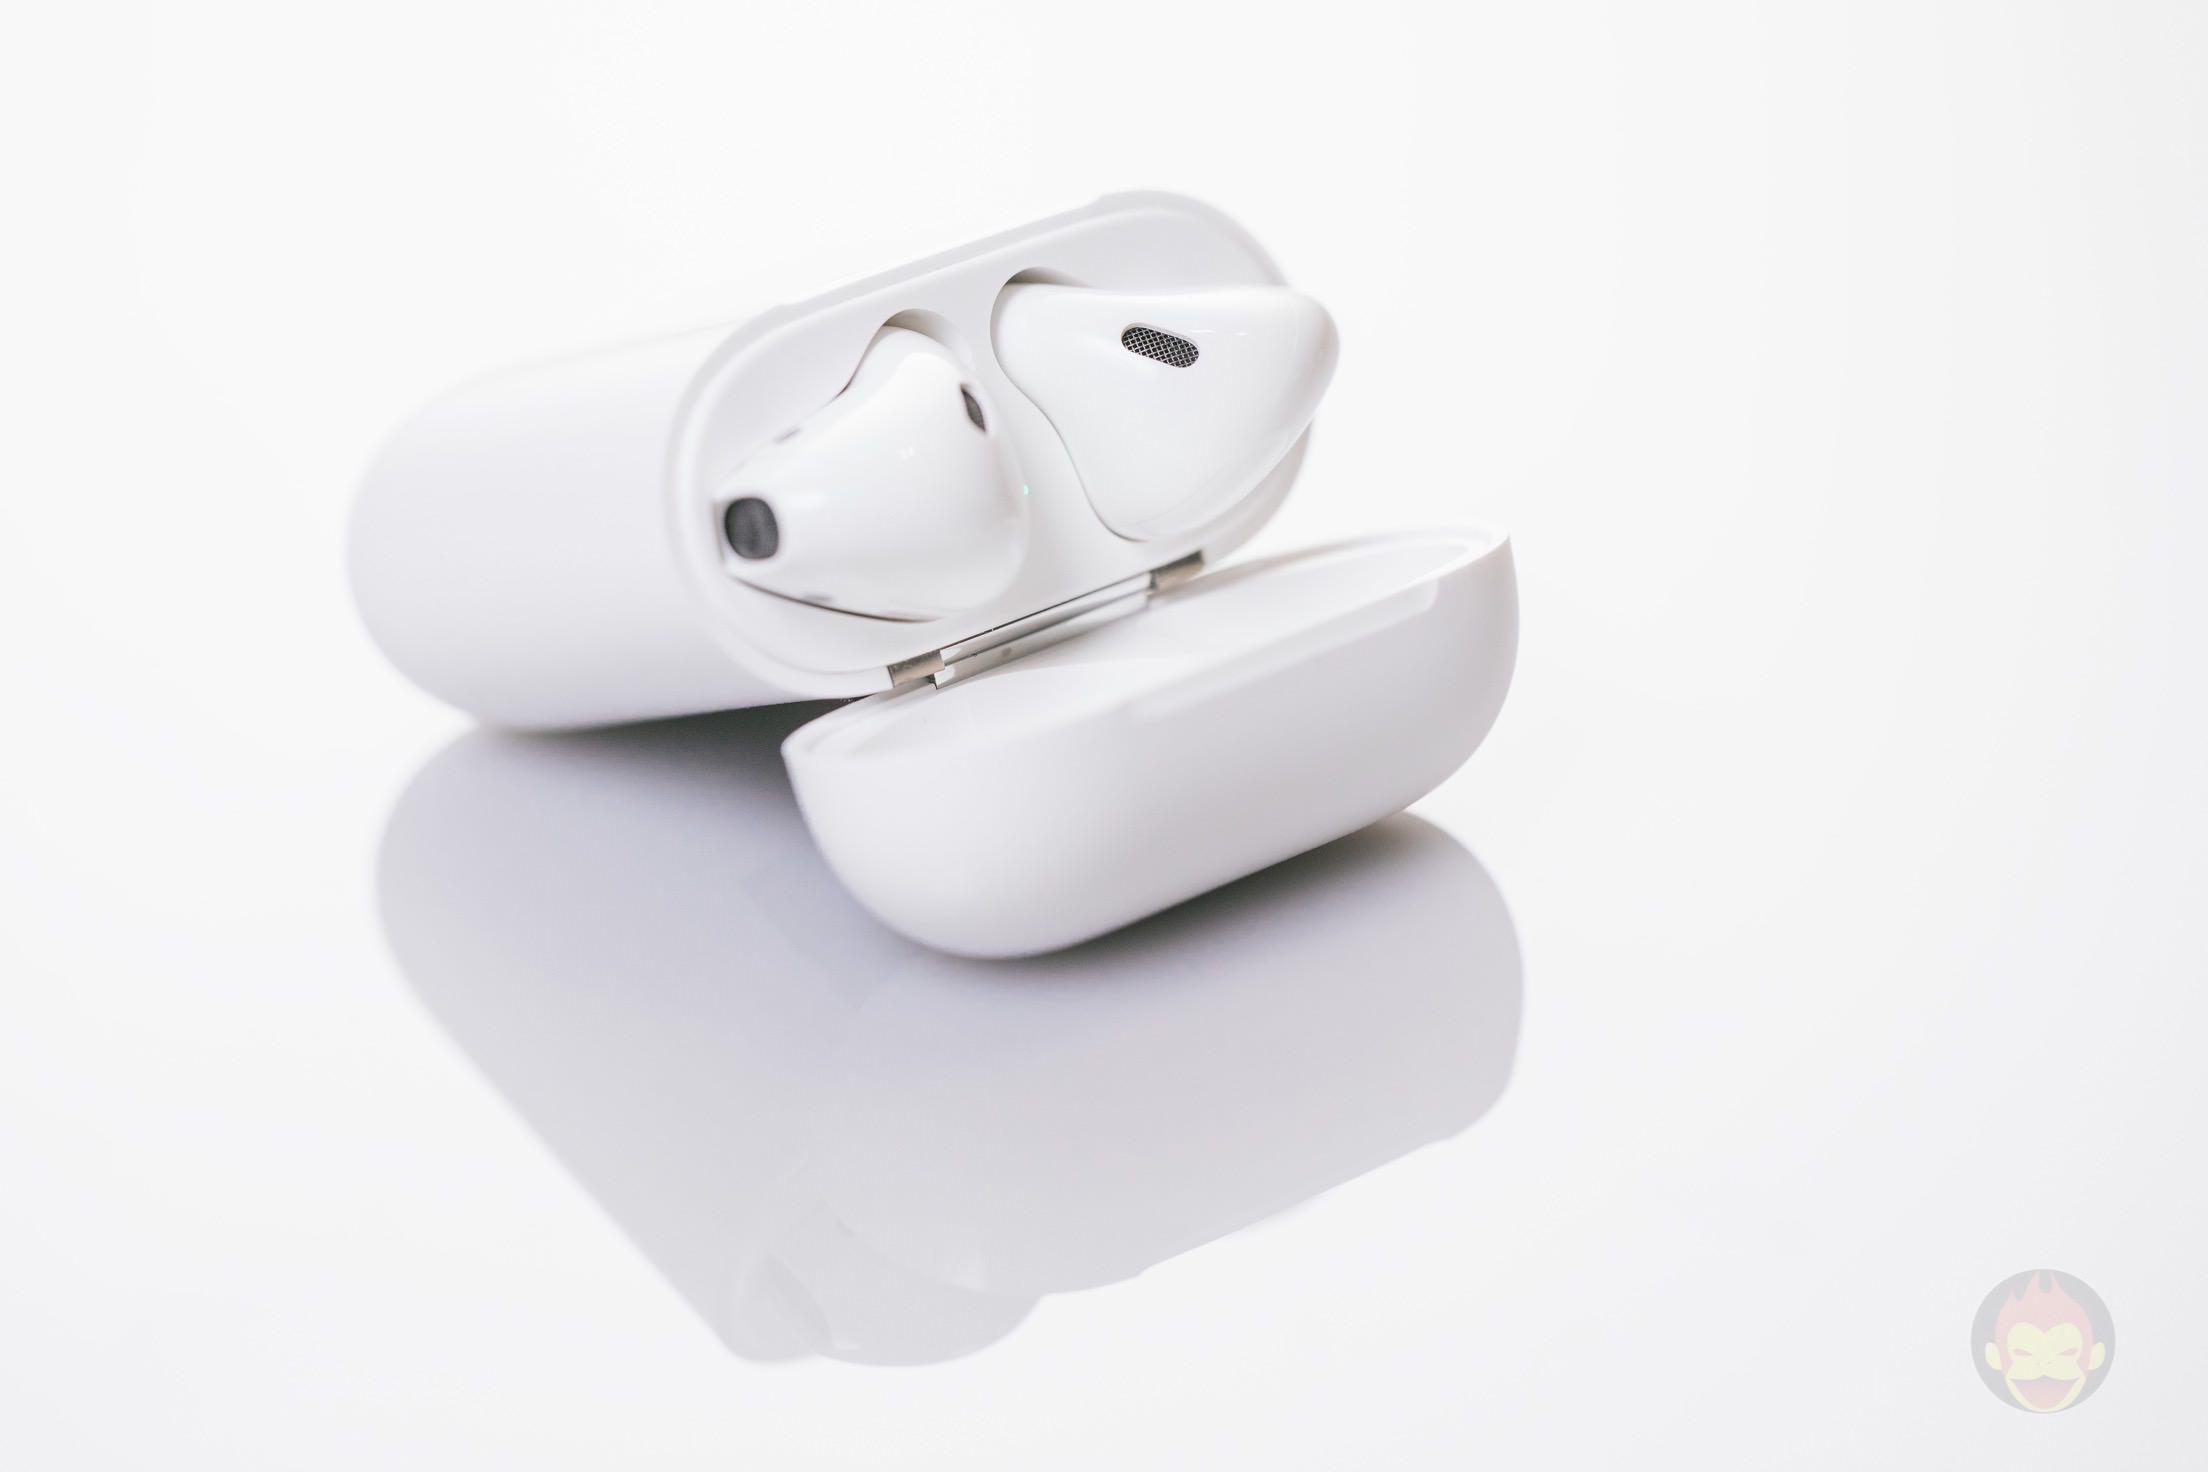 Apple Wireless Earphones AirPods Review